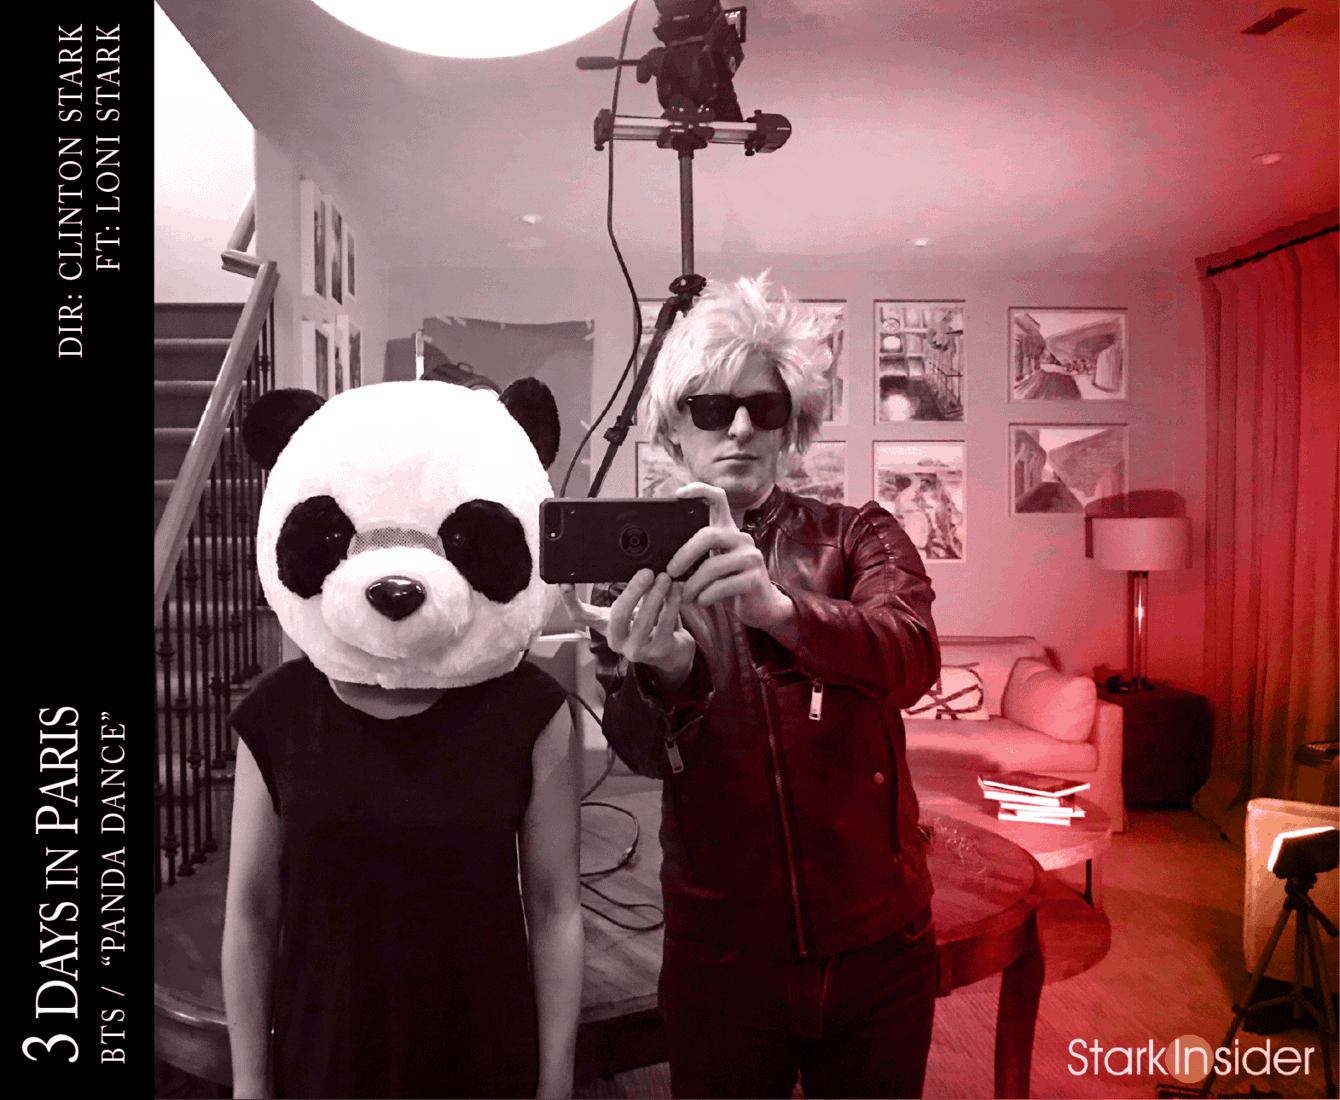 3 Days in Paris BTS Panda Dance: Loni and Clinton Stark